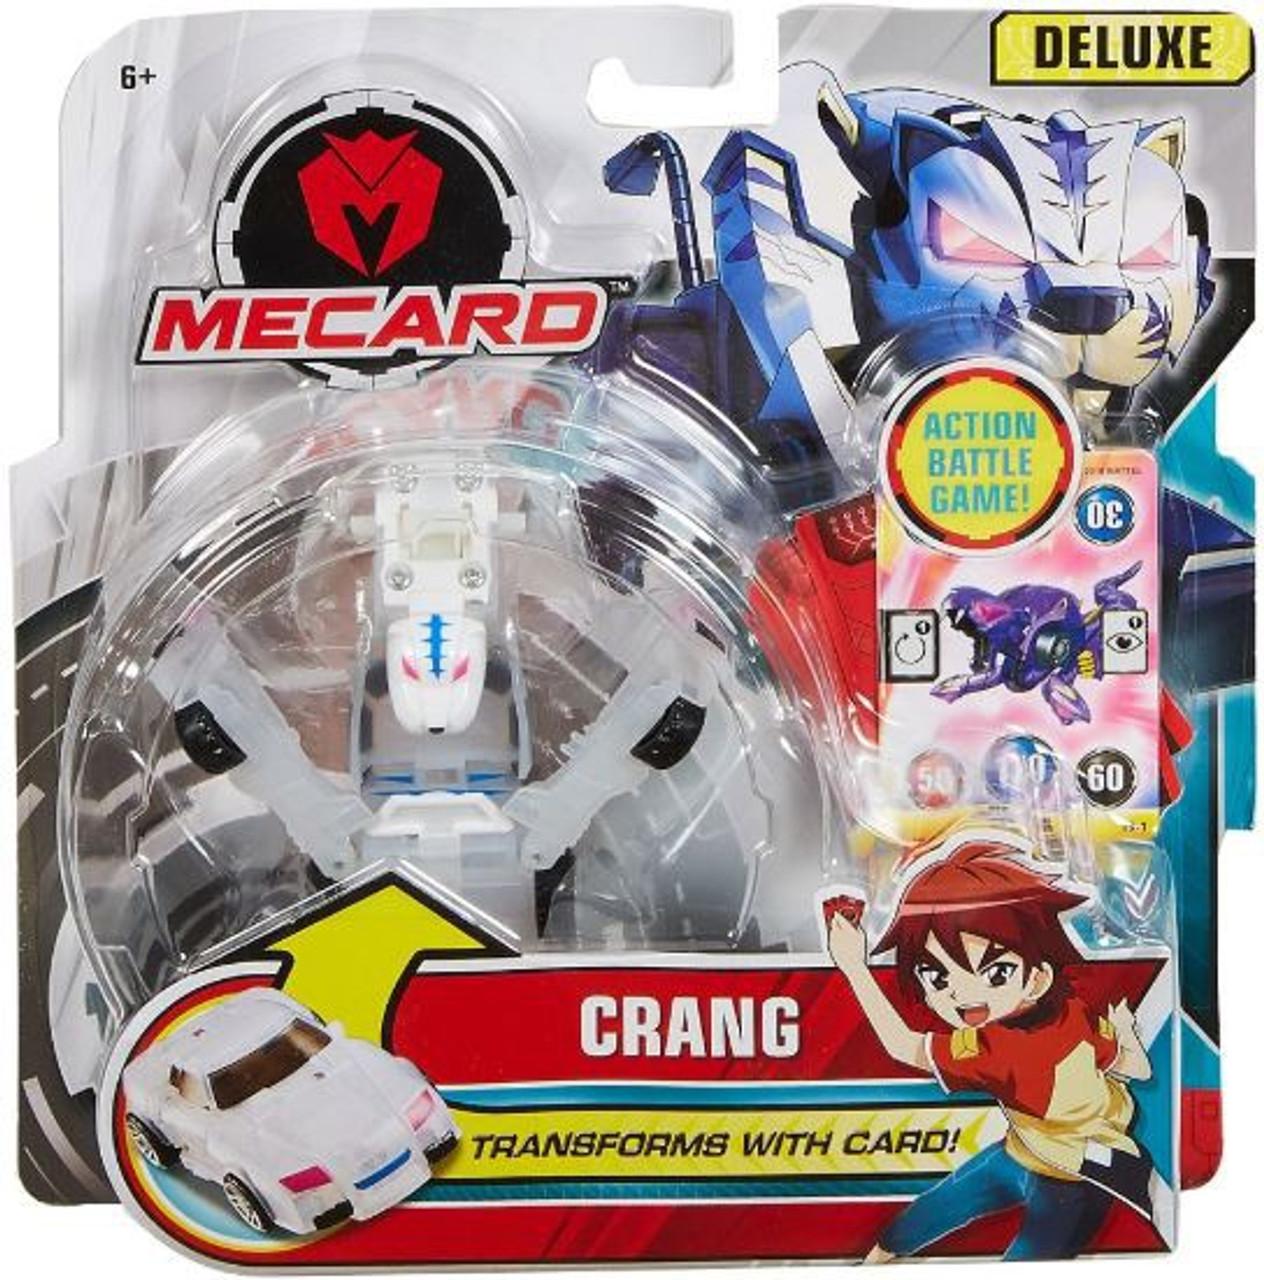 5d26cbdda37 MeCard Deluxe Mecardimal Crang Figure Mattel - ToyWiz